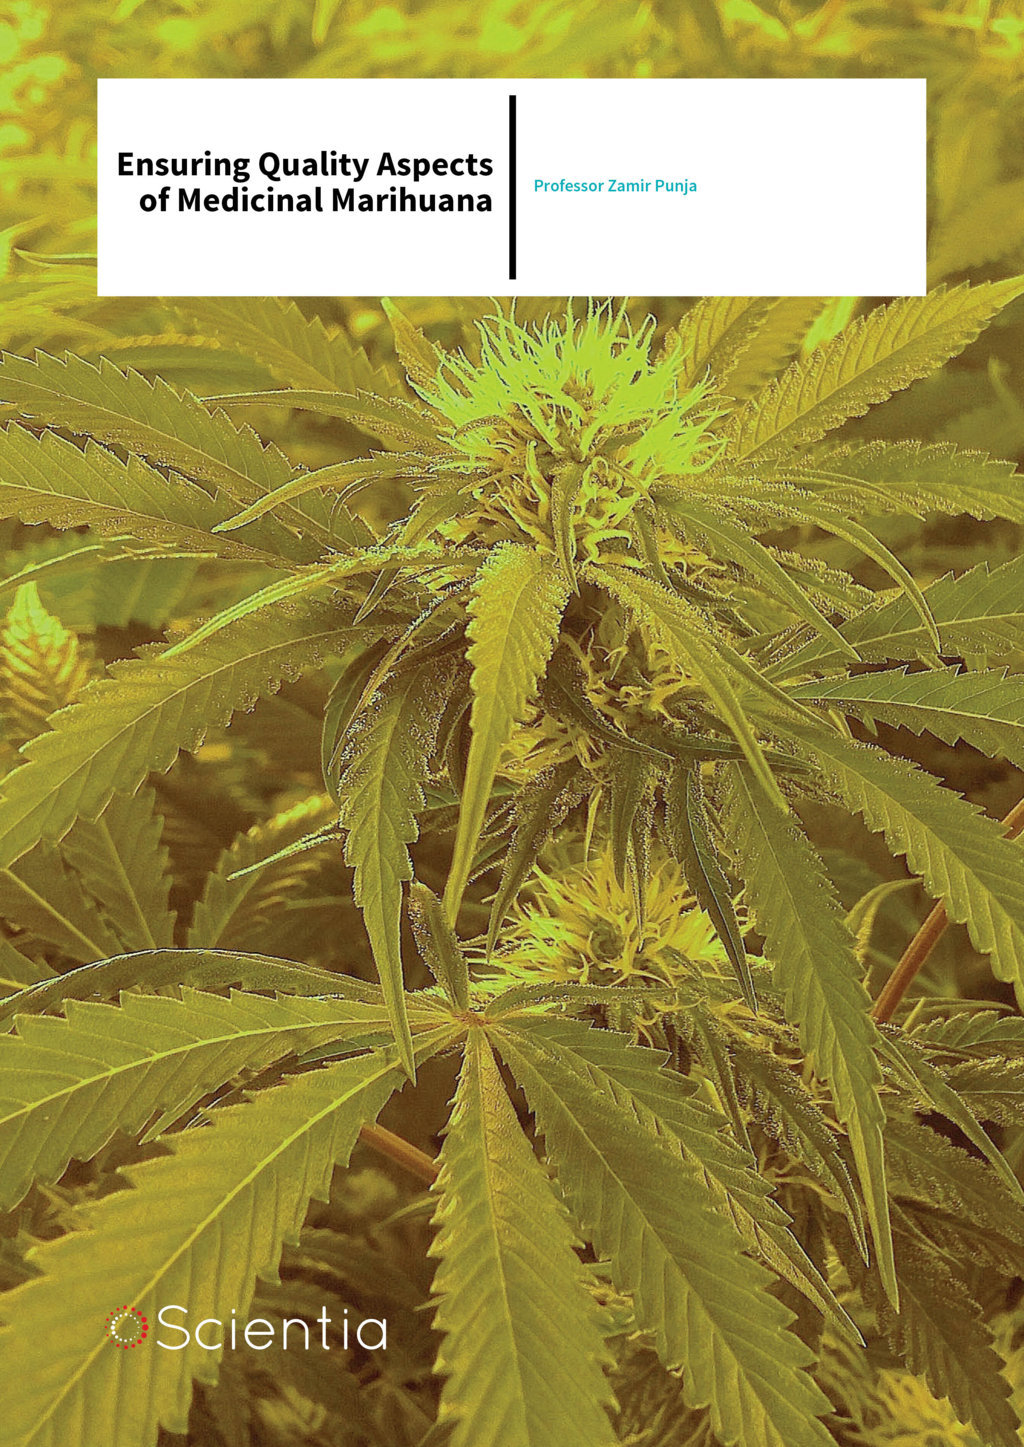 Professor Zamir Punja – Ensuring Quality Aspects of Medicinal Marihuana